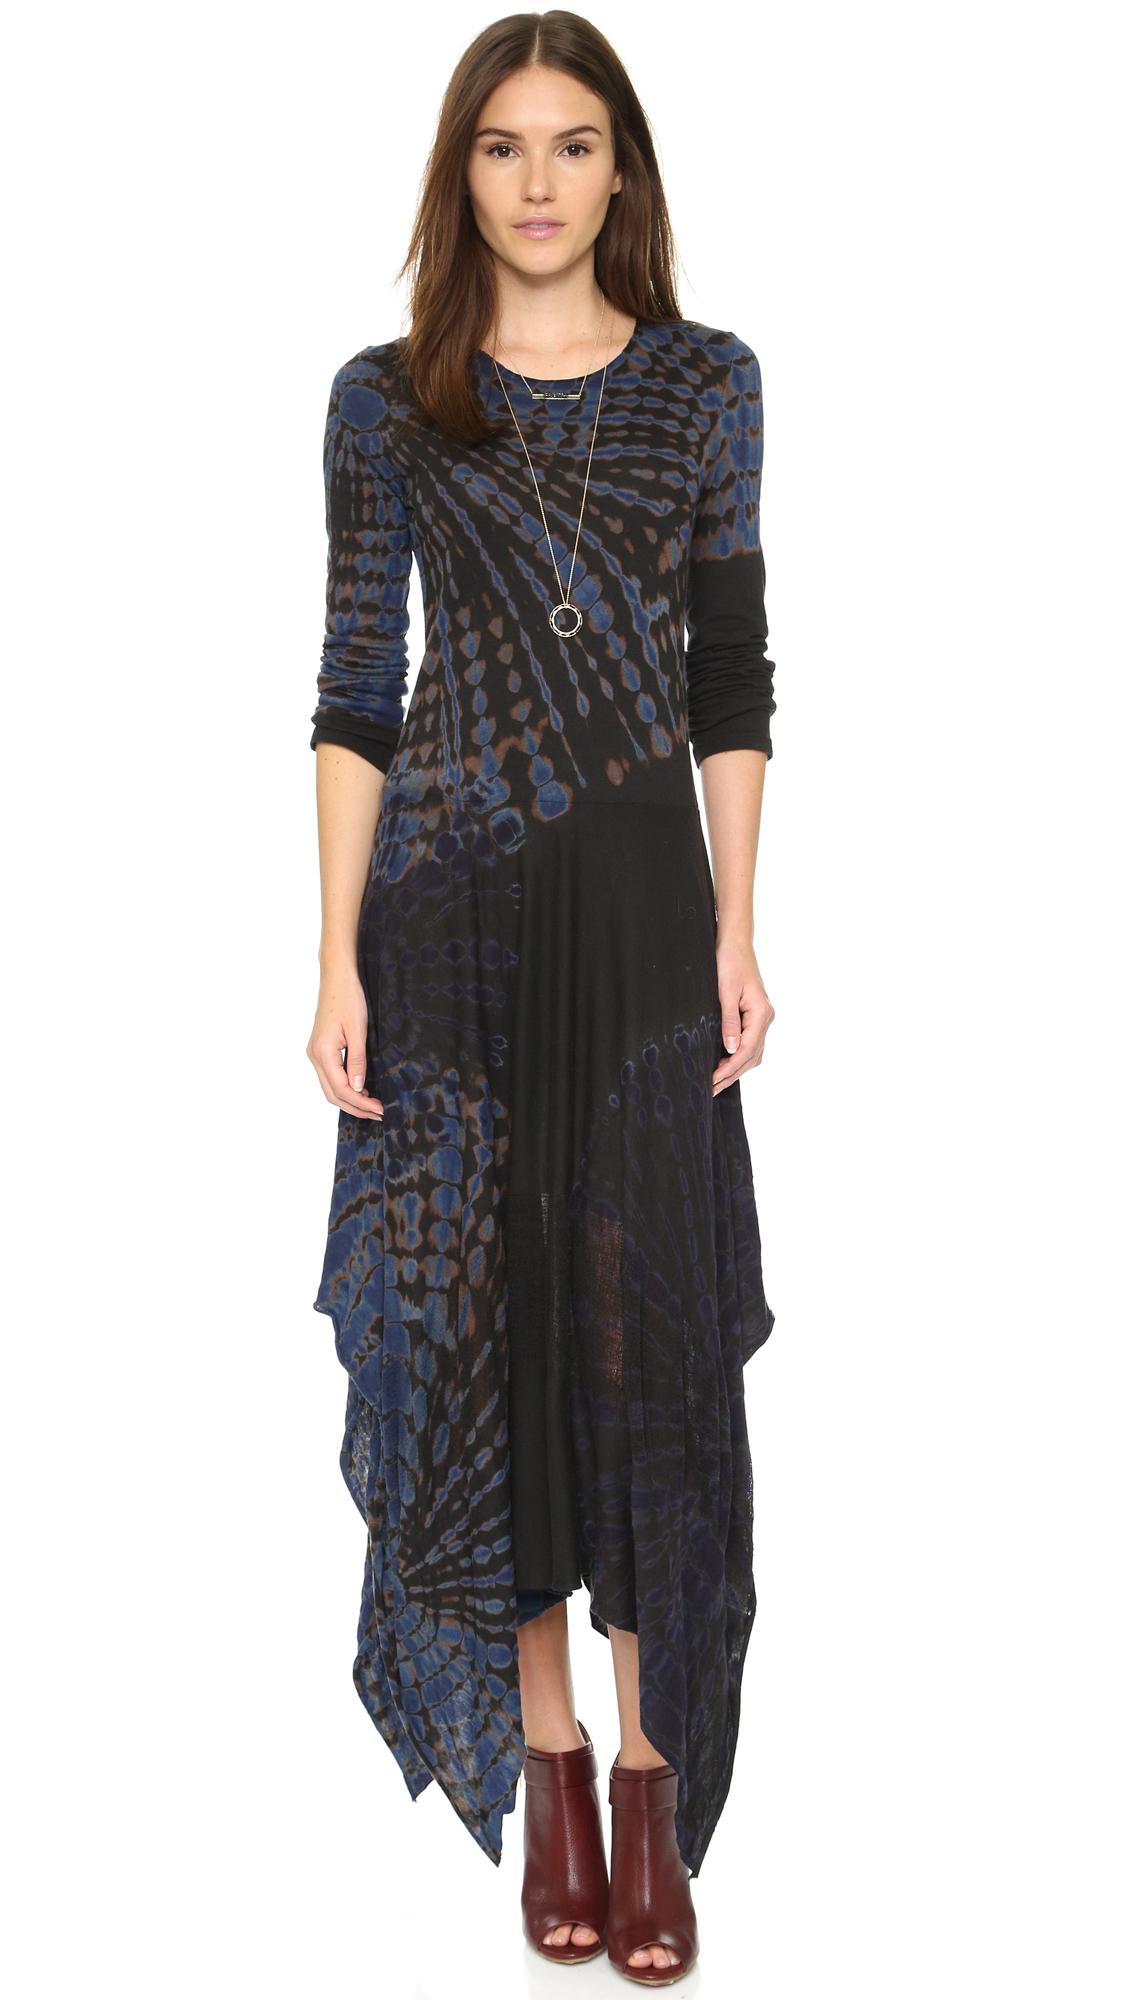 Handkerchief Dress with Sleeves